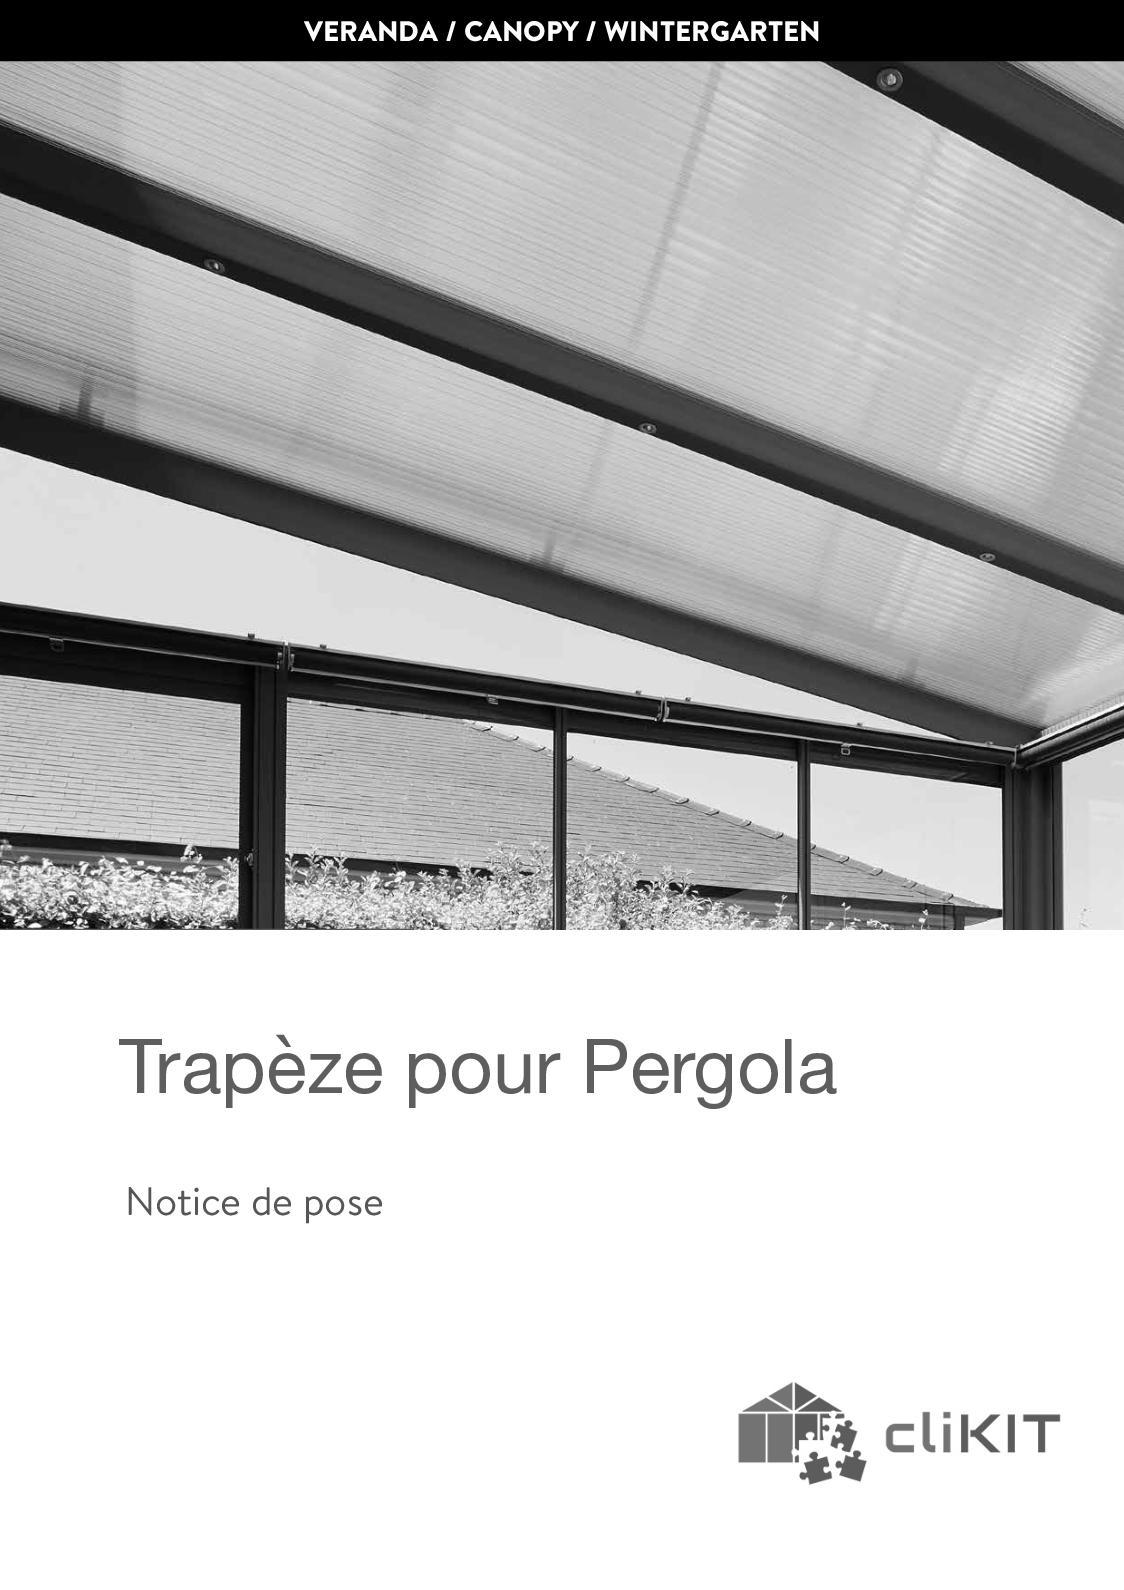 Calameo Clikit Notice De Pose Paroi Trapeze